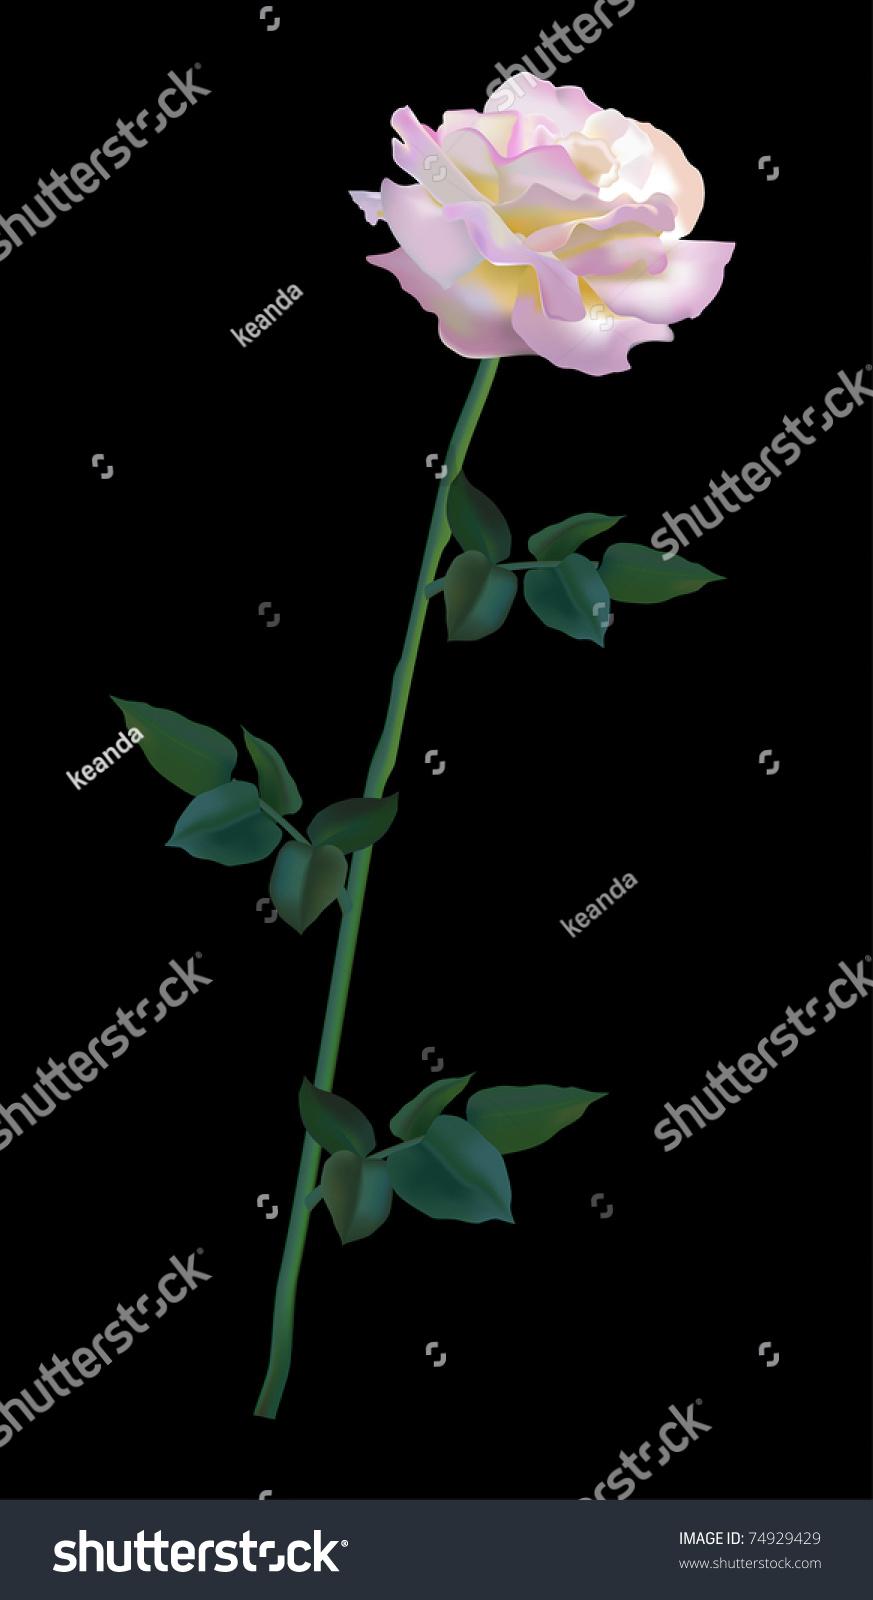 rosa gloria dei vector rose 74929429 shutterstock. Black Bedroom Furniture Sets. Home Design Ideas